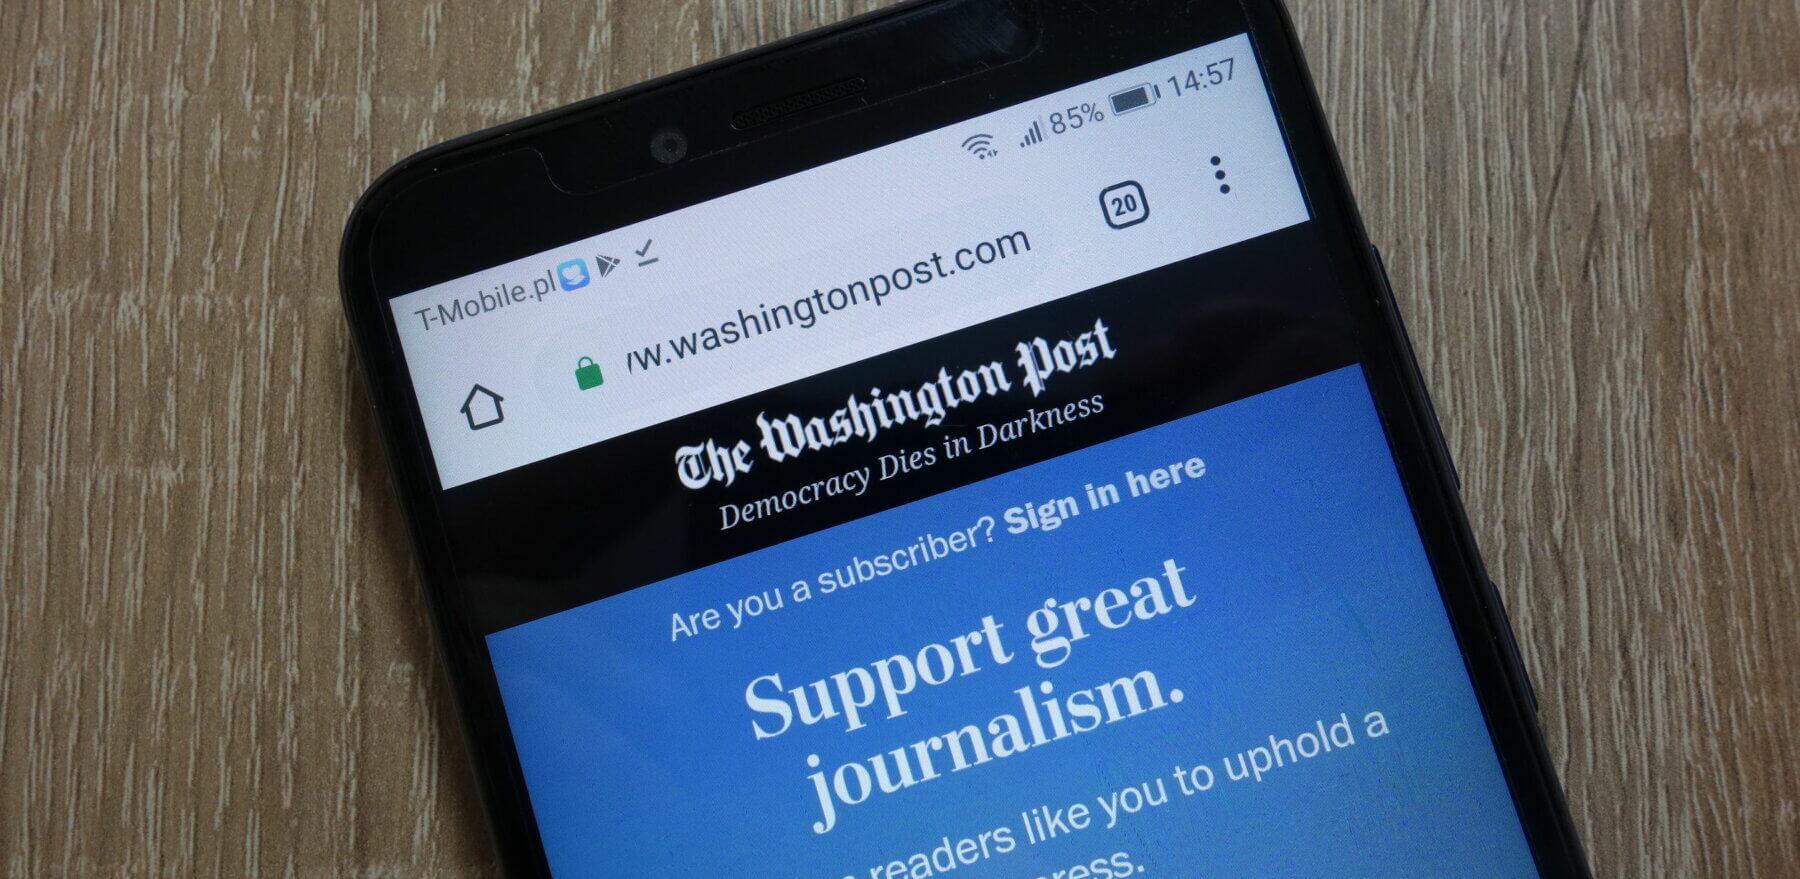 117319234 - konskie, poland - december 09, 2018: the washington post website (www.washingtonpost.com) displayed on smartphone